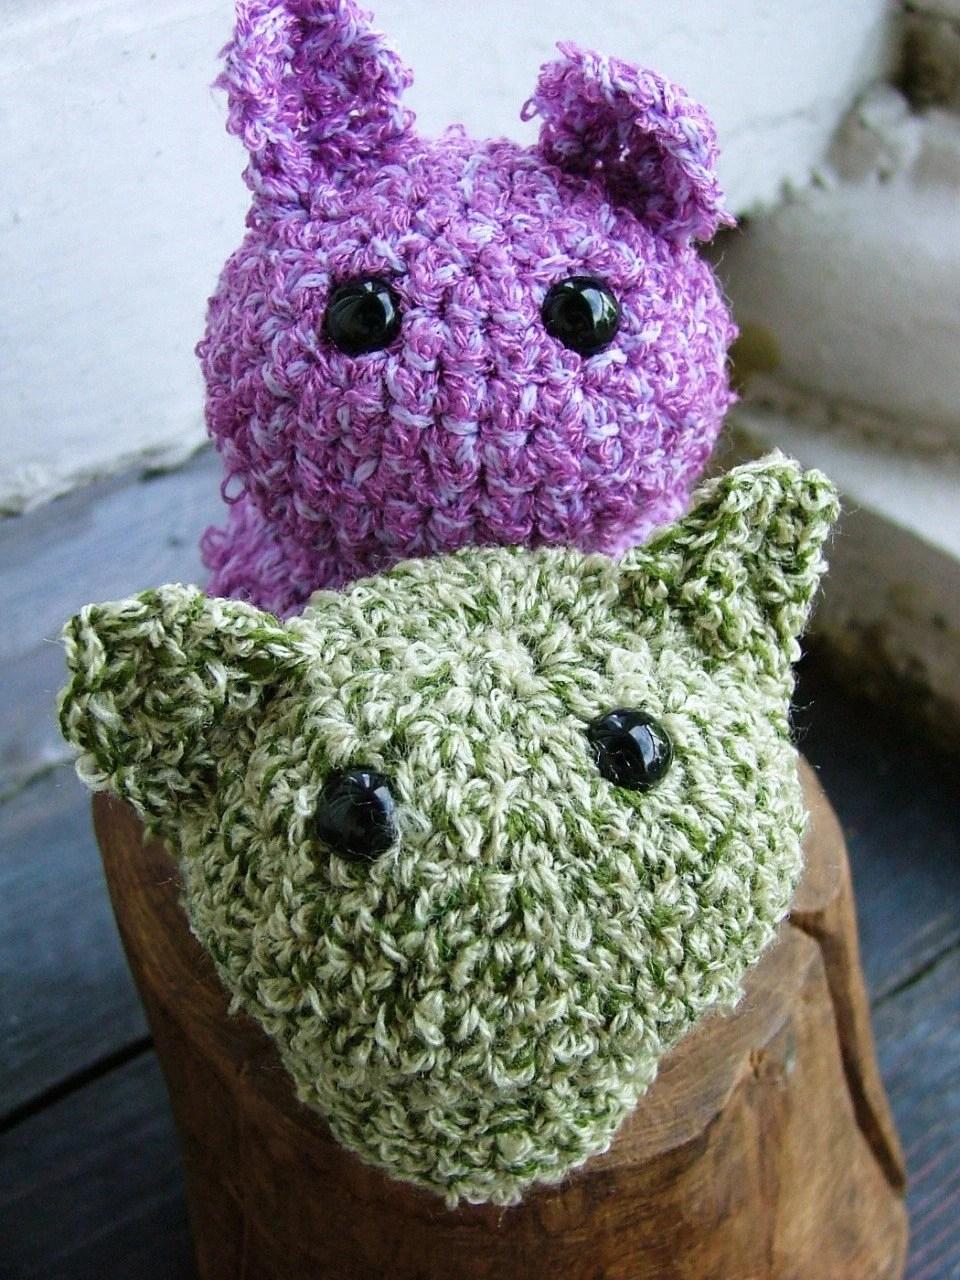 Crochet Kit- Make Your Own Amigurumi Friend